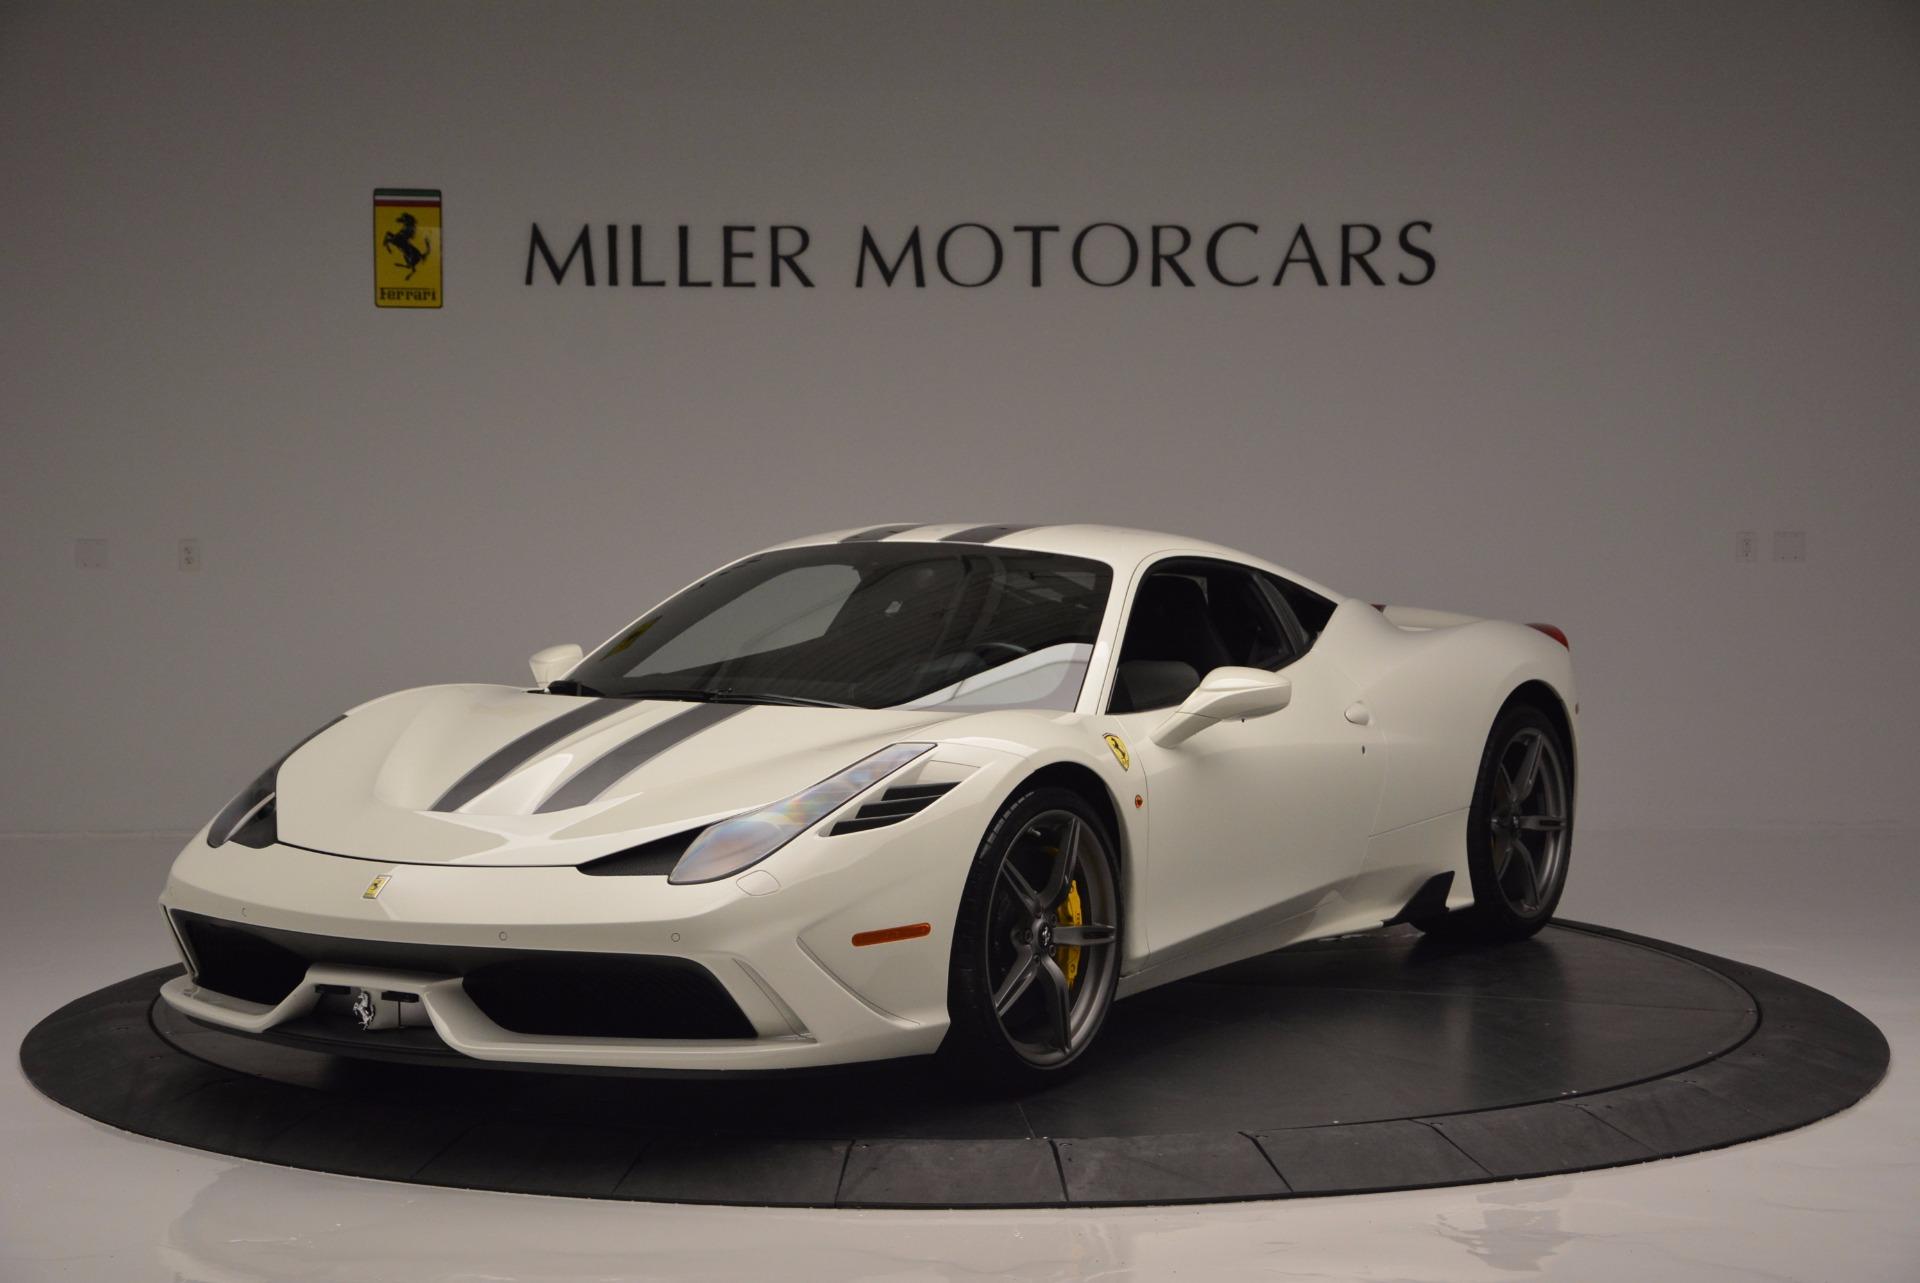 Used 2015 Ferrari 458 Speciale for sale Sold at Maserati of Westport in Westport CT 06880 1